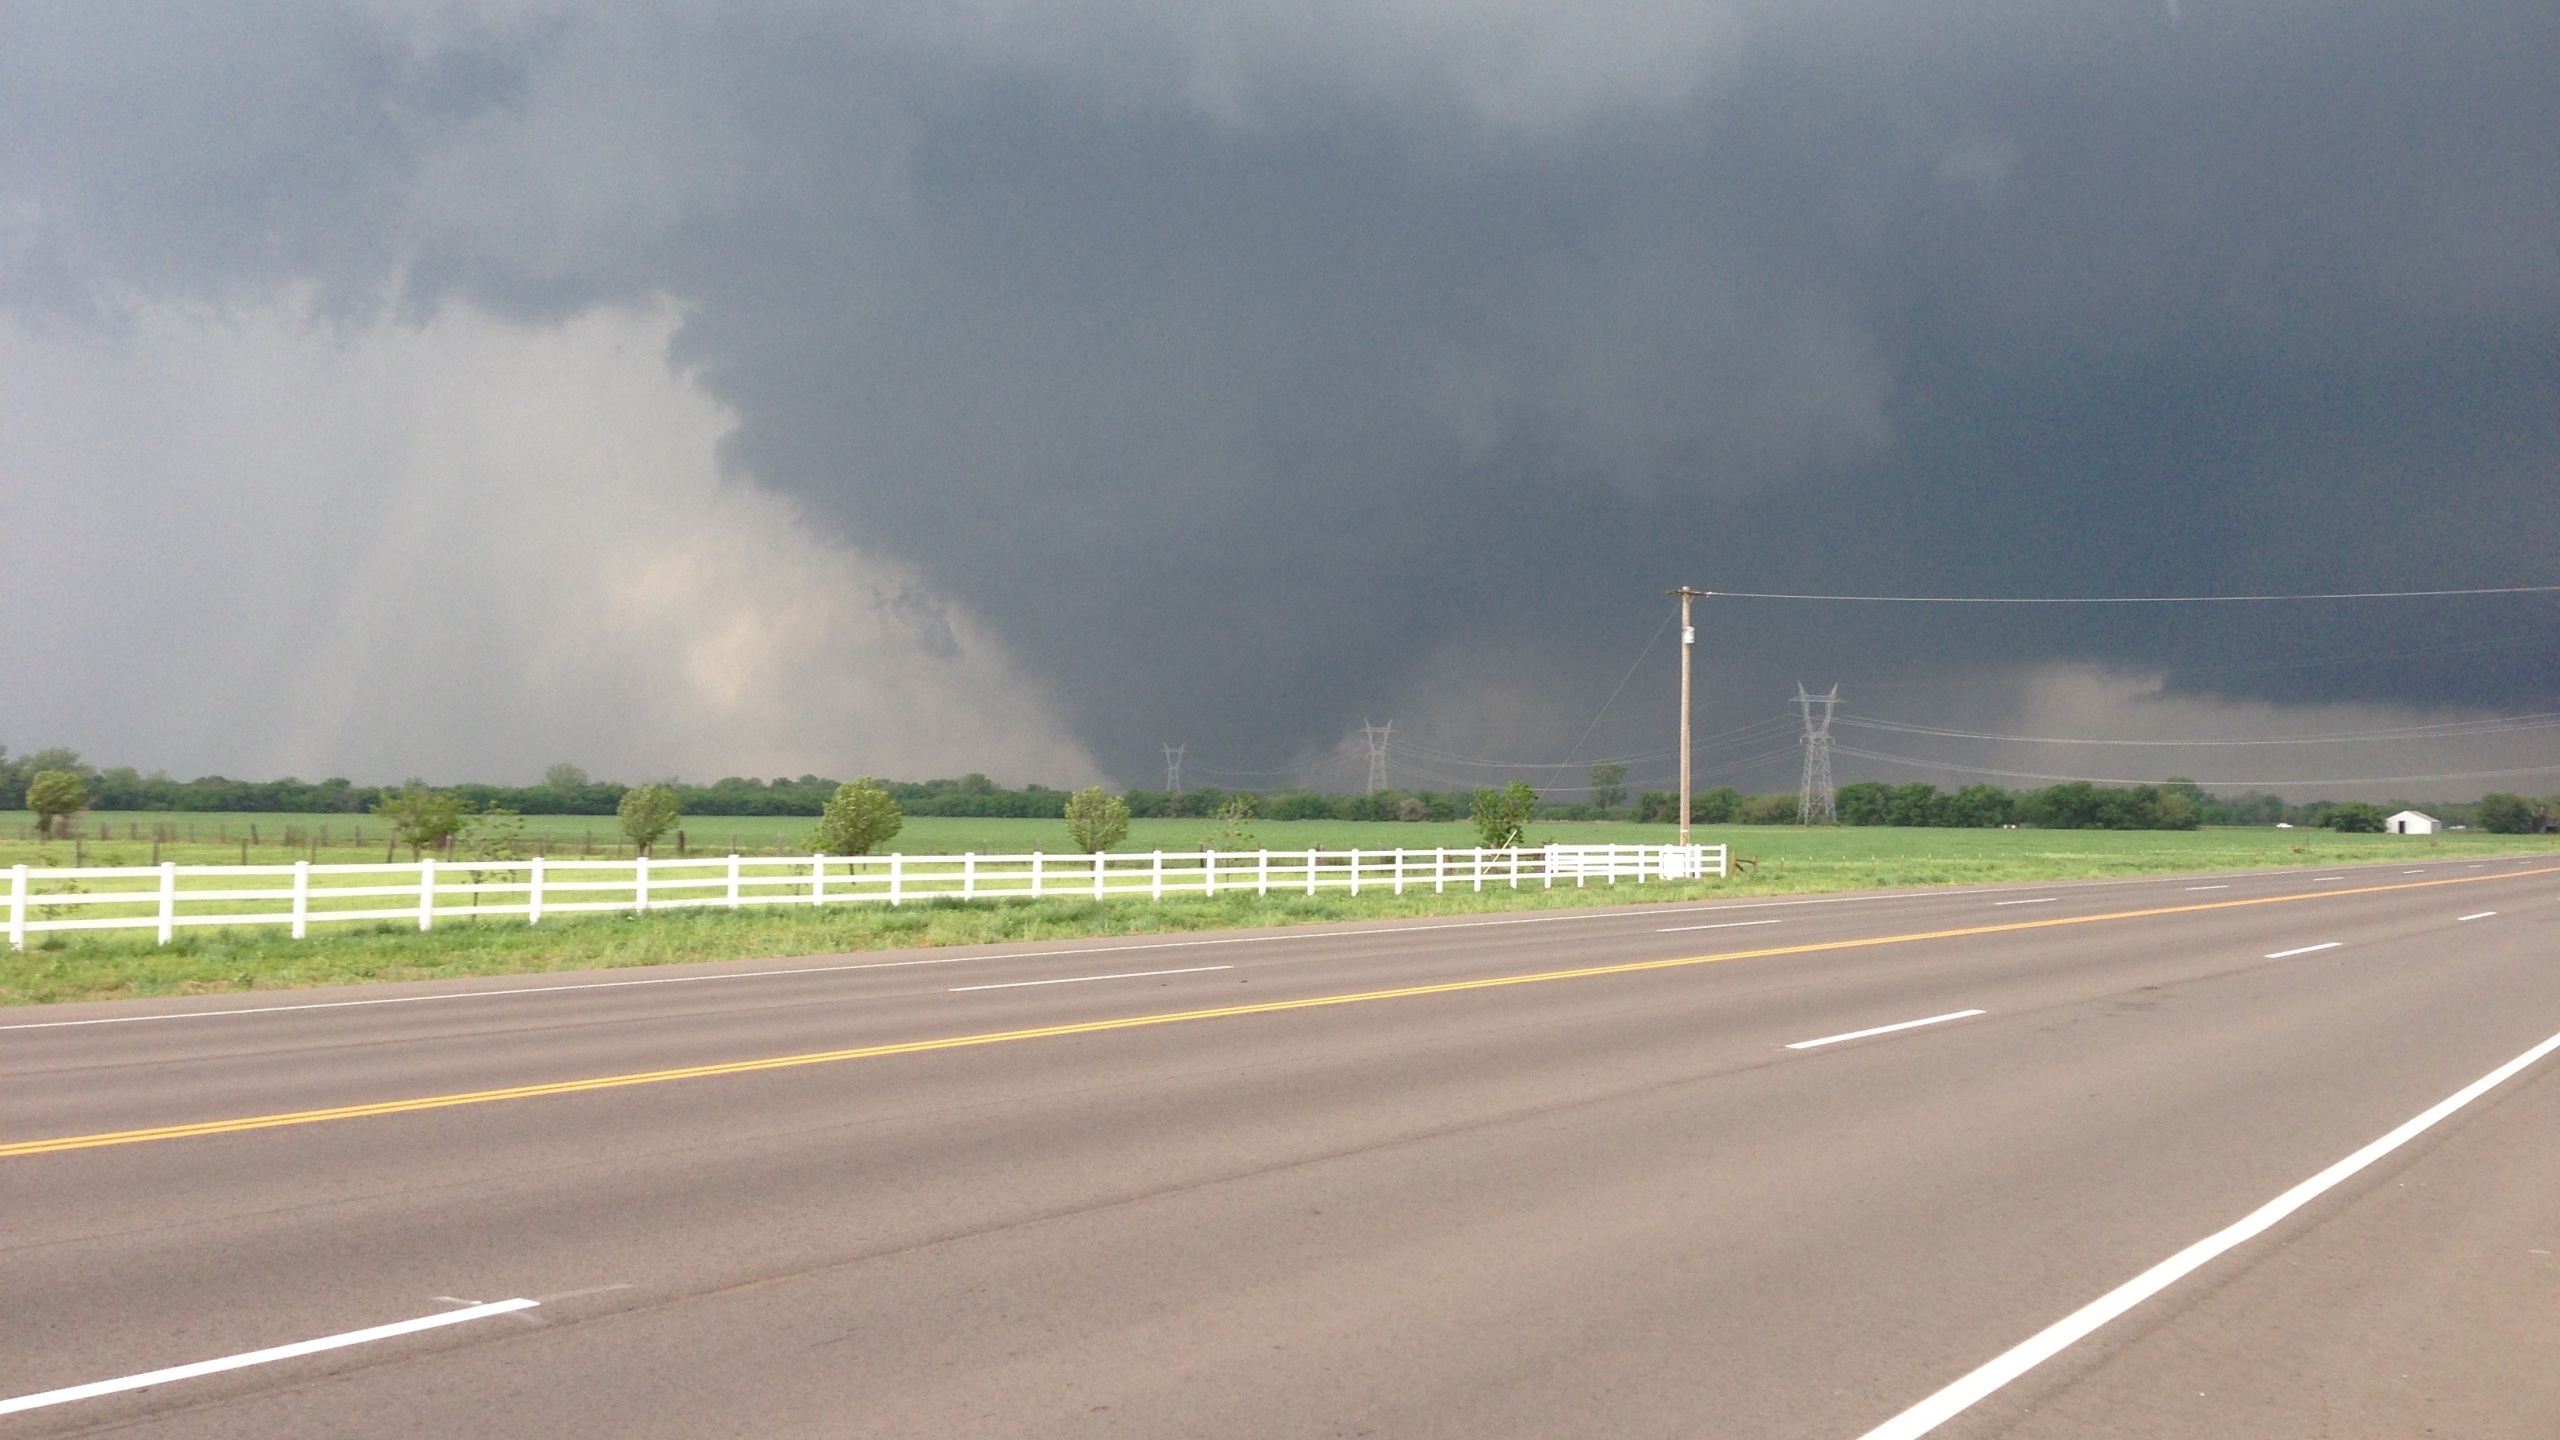 Moore Oklahoma tornado may 20 2013_1527226821062.JPG.jpg